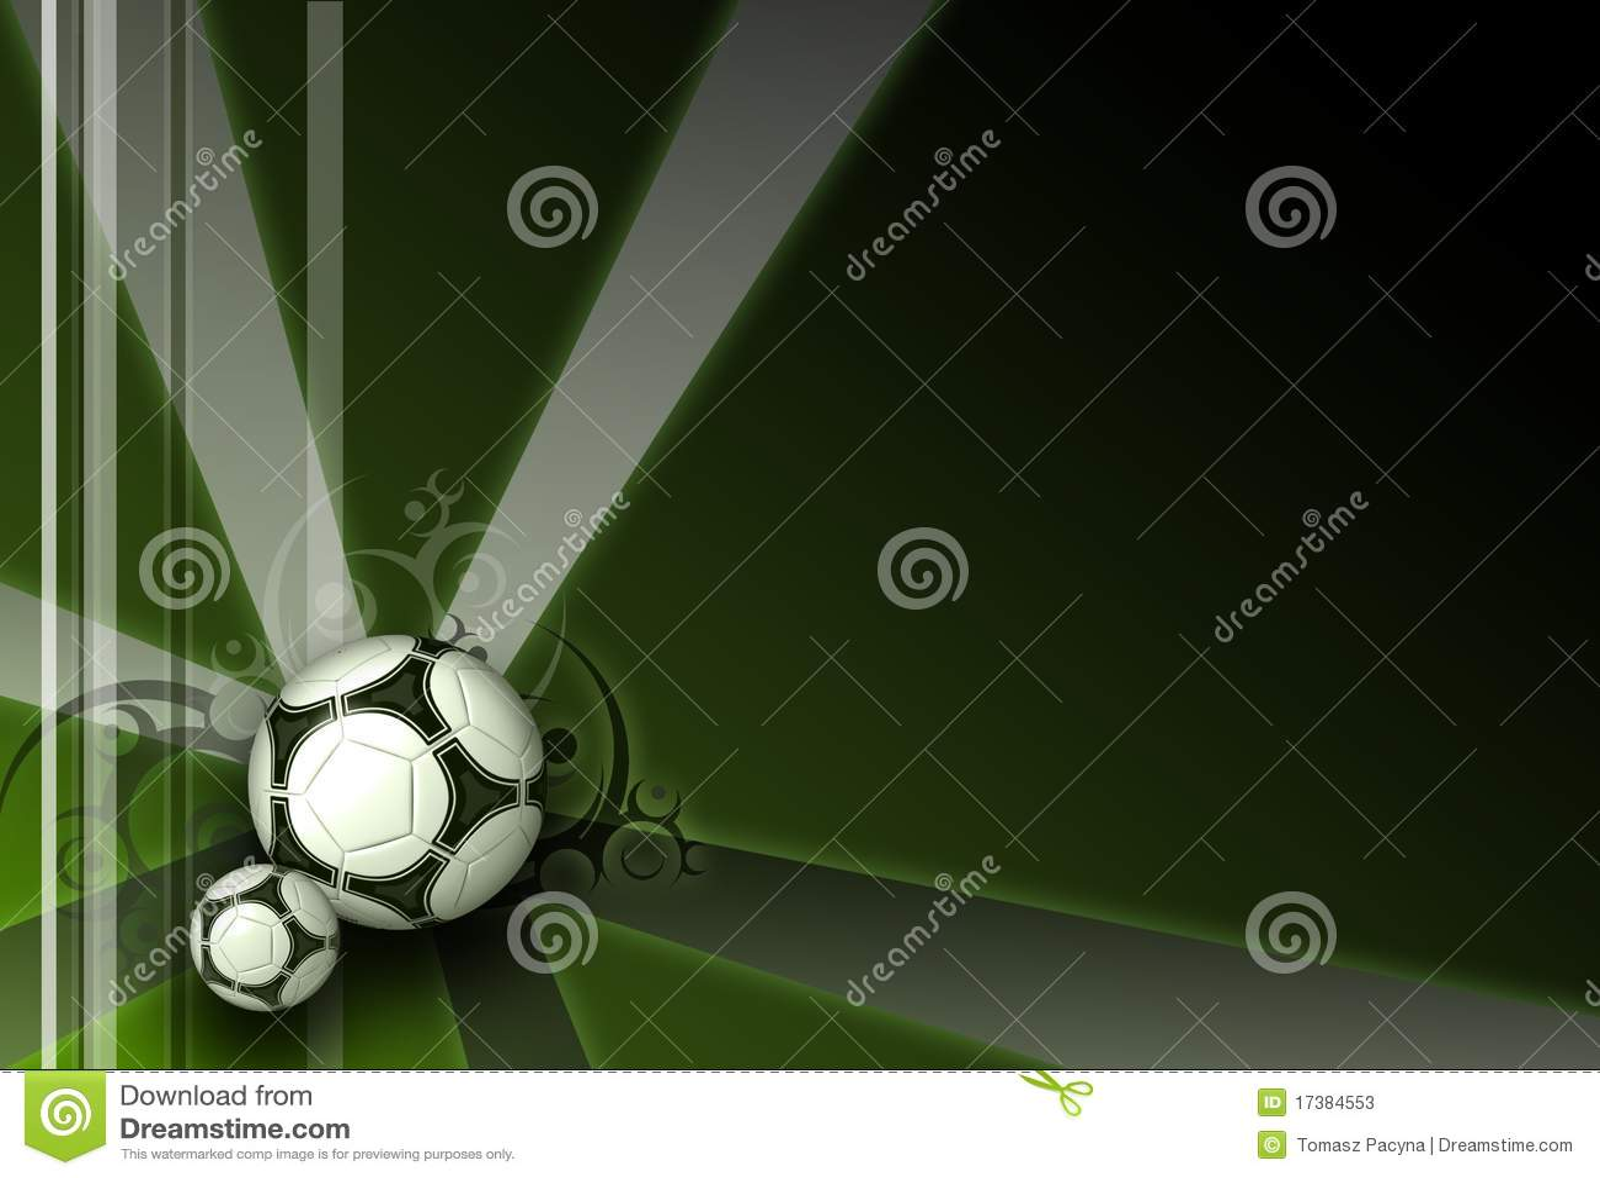 fond vert fonc d 39 l gance du football photos stock image 17384553. Black Bedroom Furniture Sets. Home Design Ideas